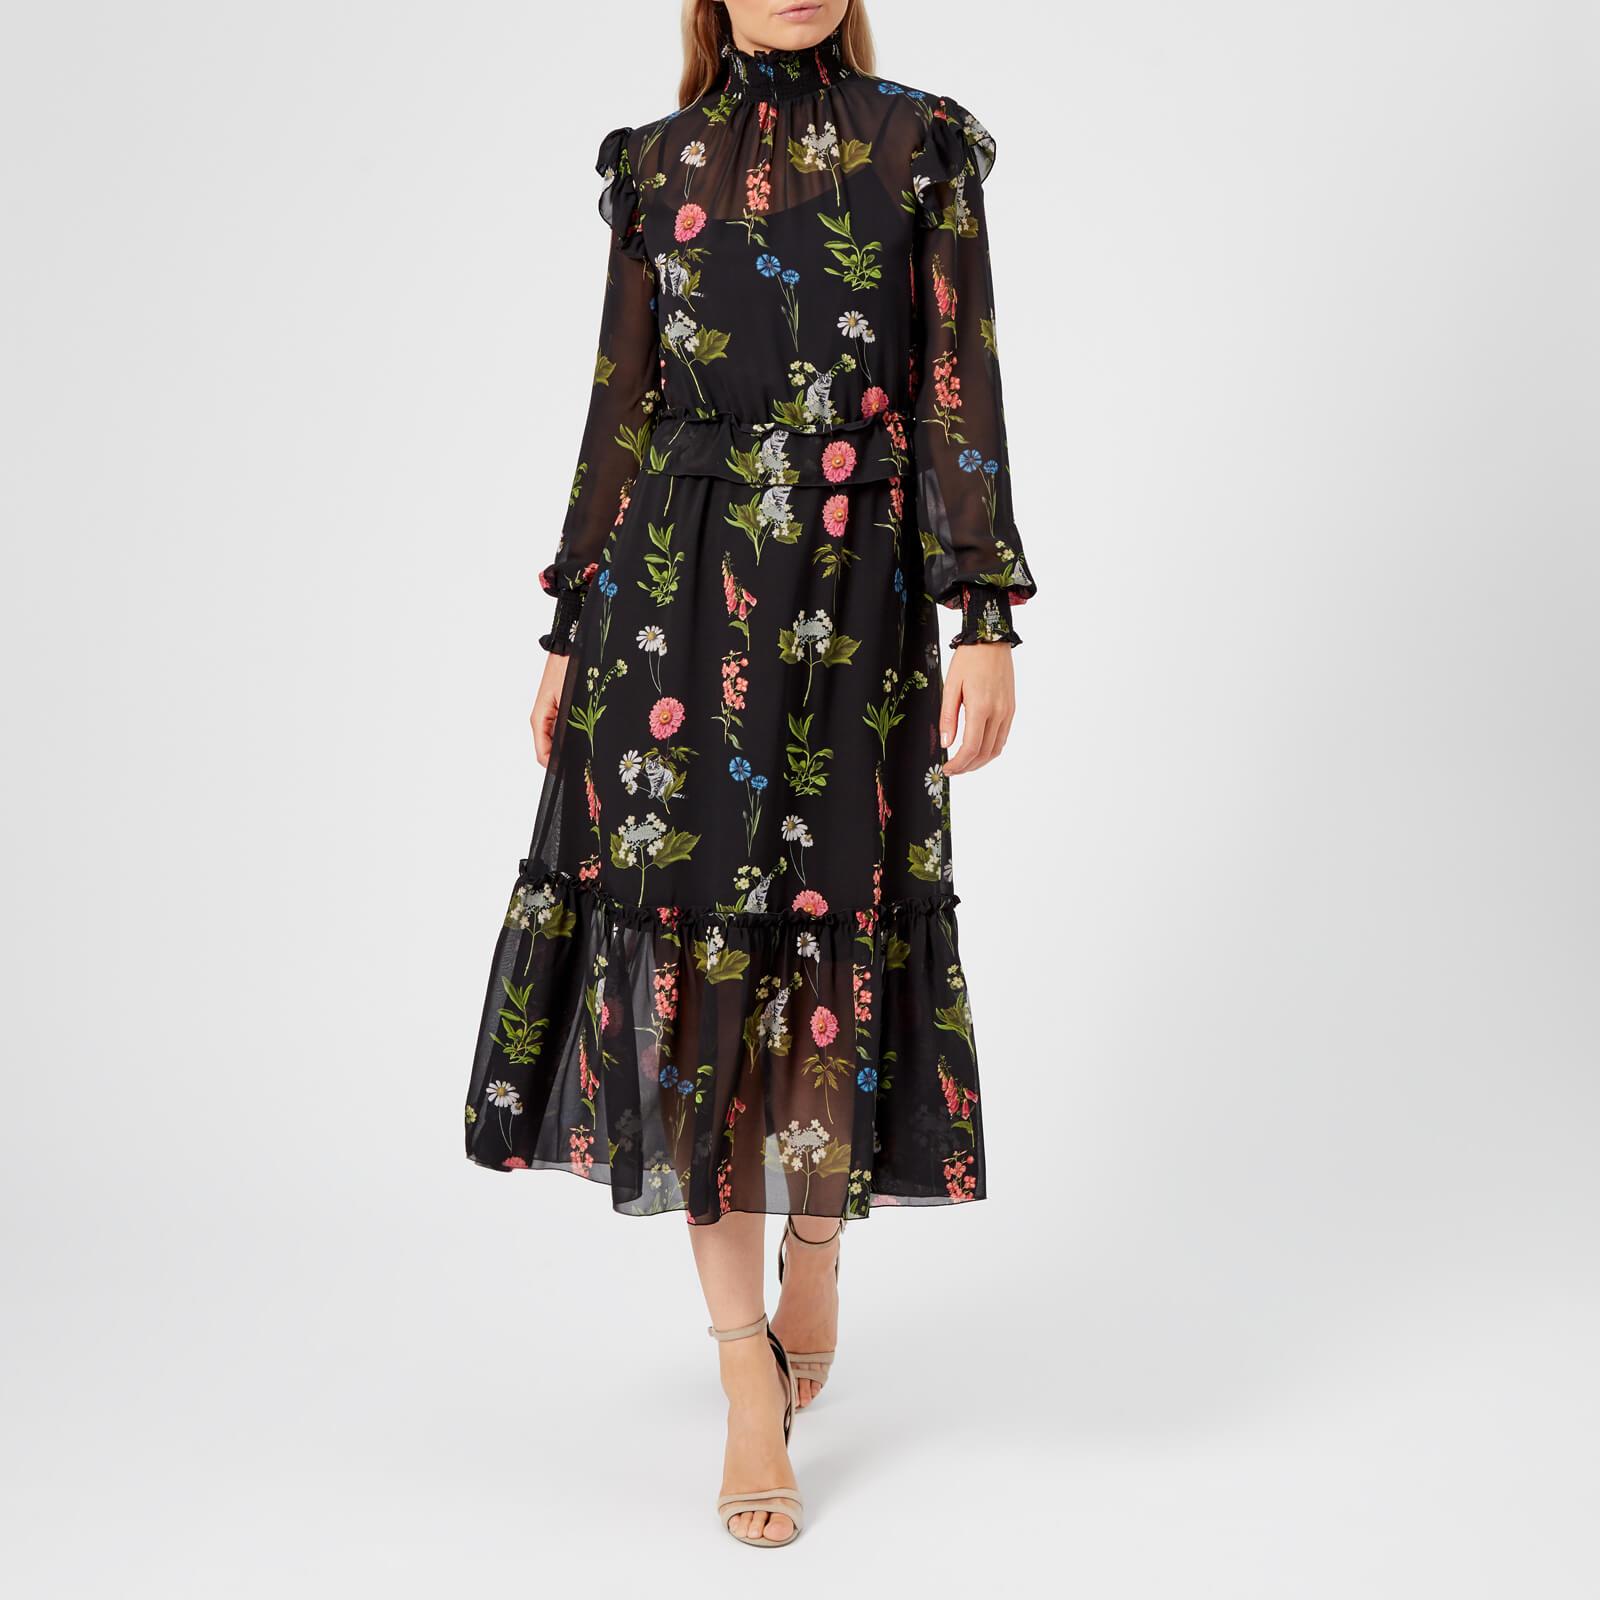 Baker Qugzvmsp Florence Dress Black Women's Midi Simarra Long Sleeve Ted yvf6Yb7Ig